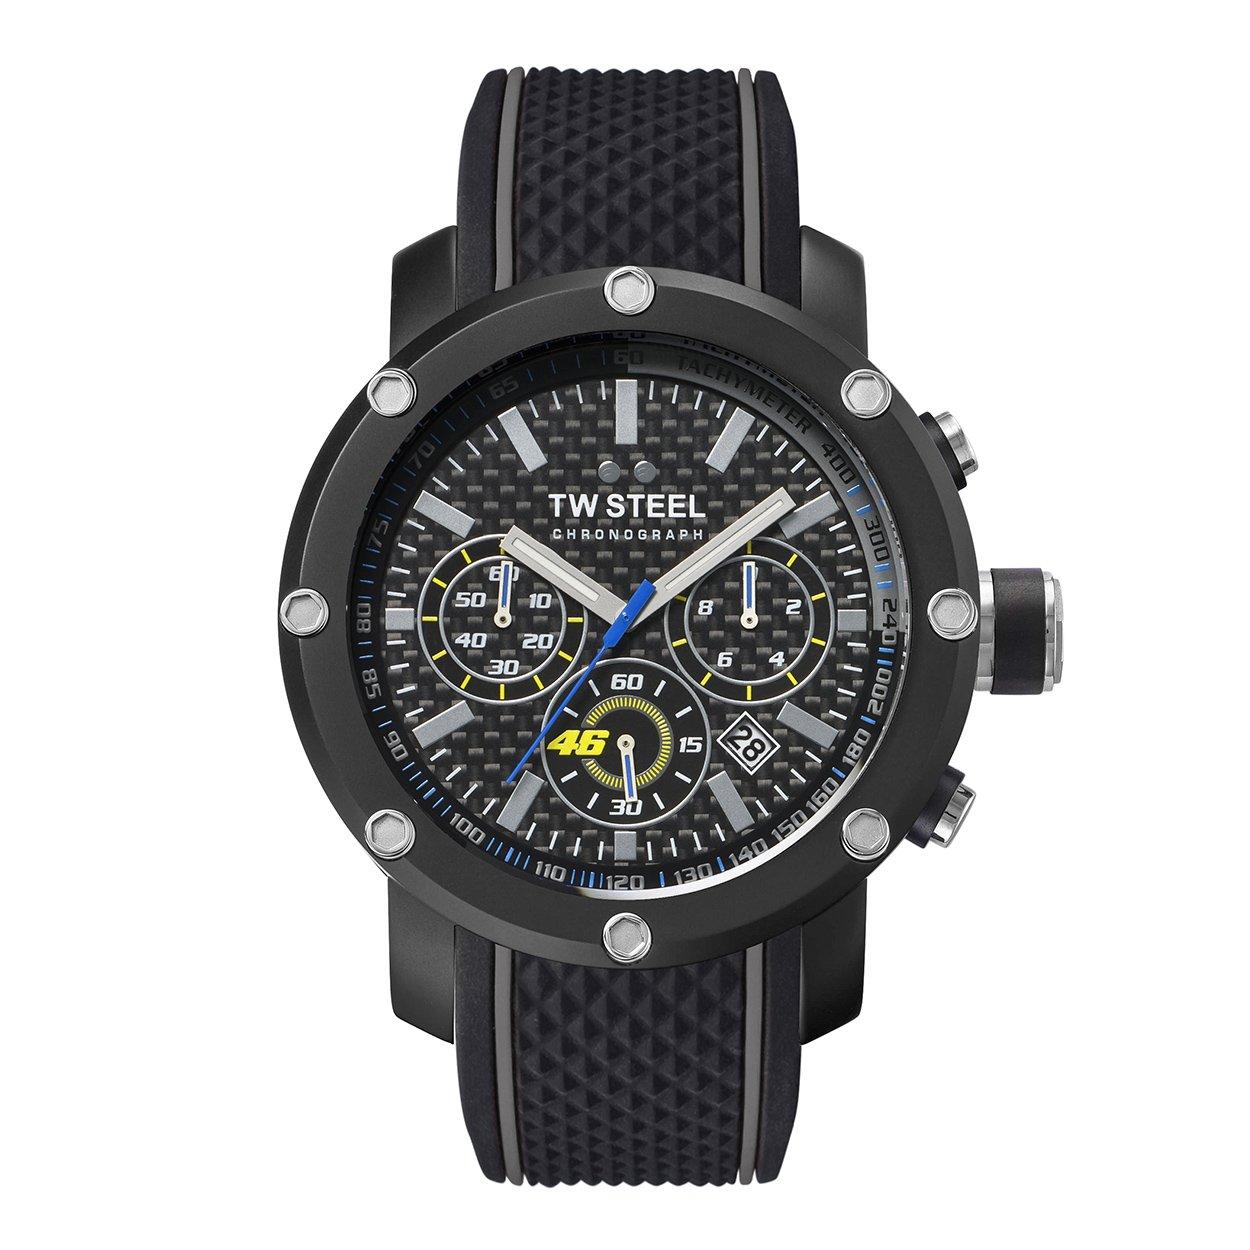 fcb5705b939 TW Steel Men s Chronograph Quartz Watch with Silicone Strap TW937   Amazon.co.uk  Watches